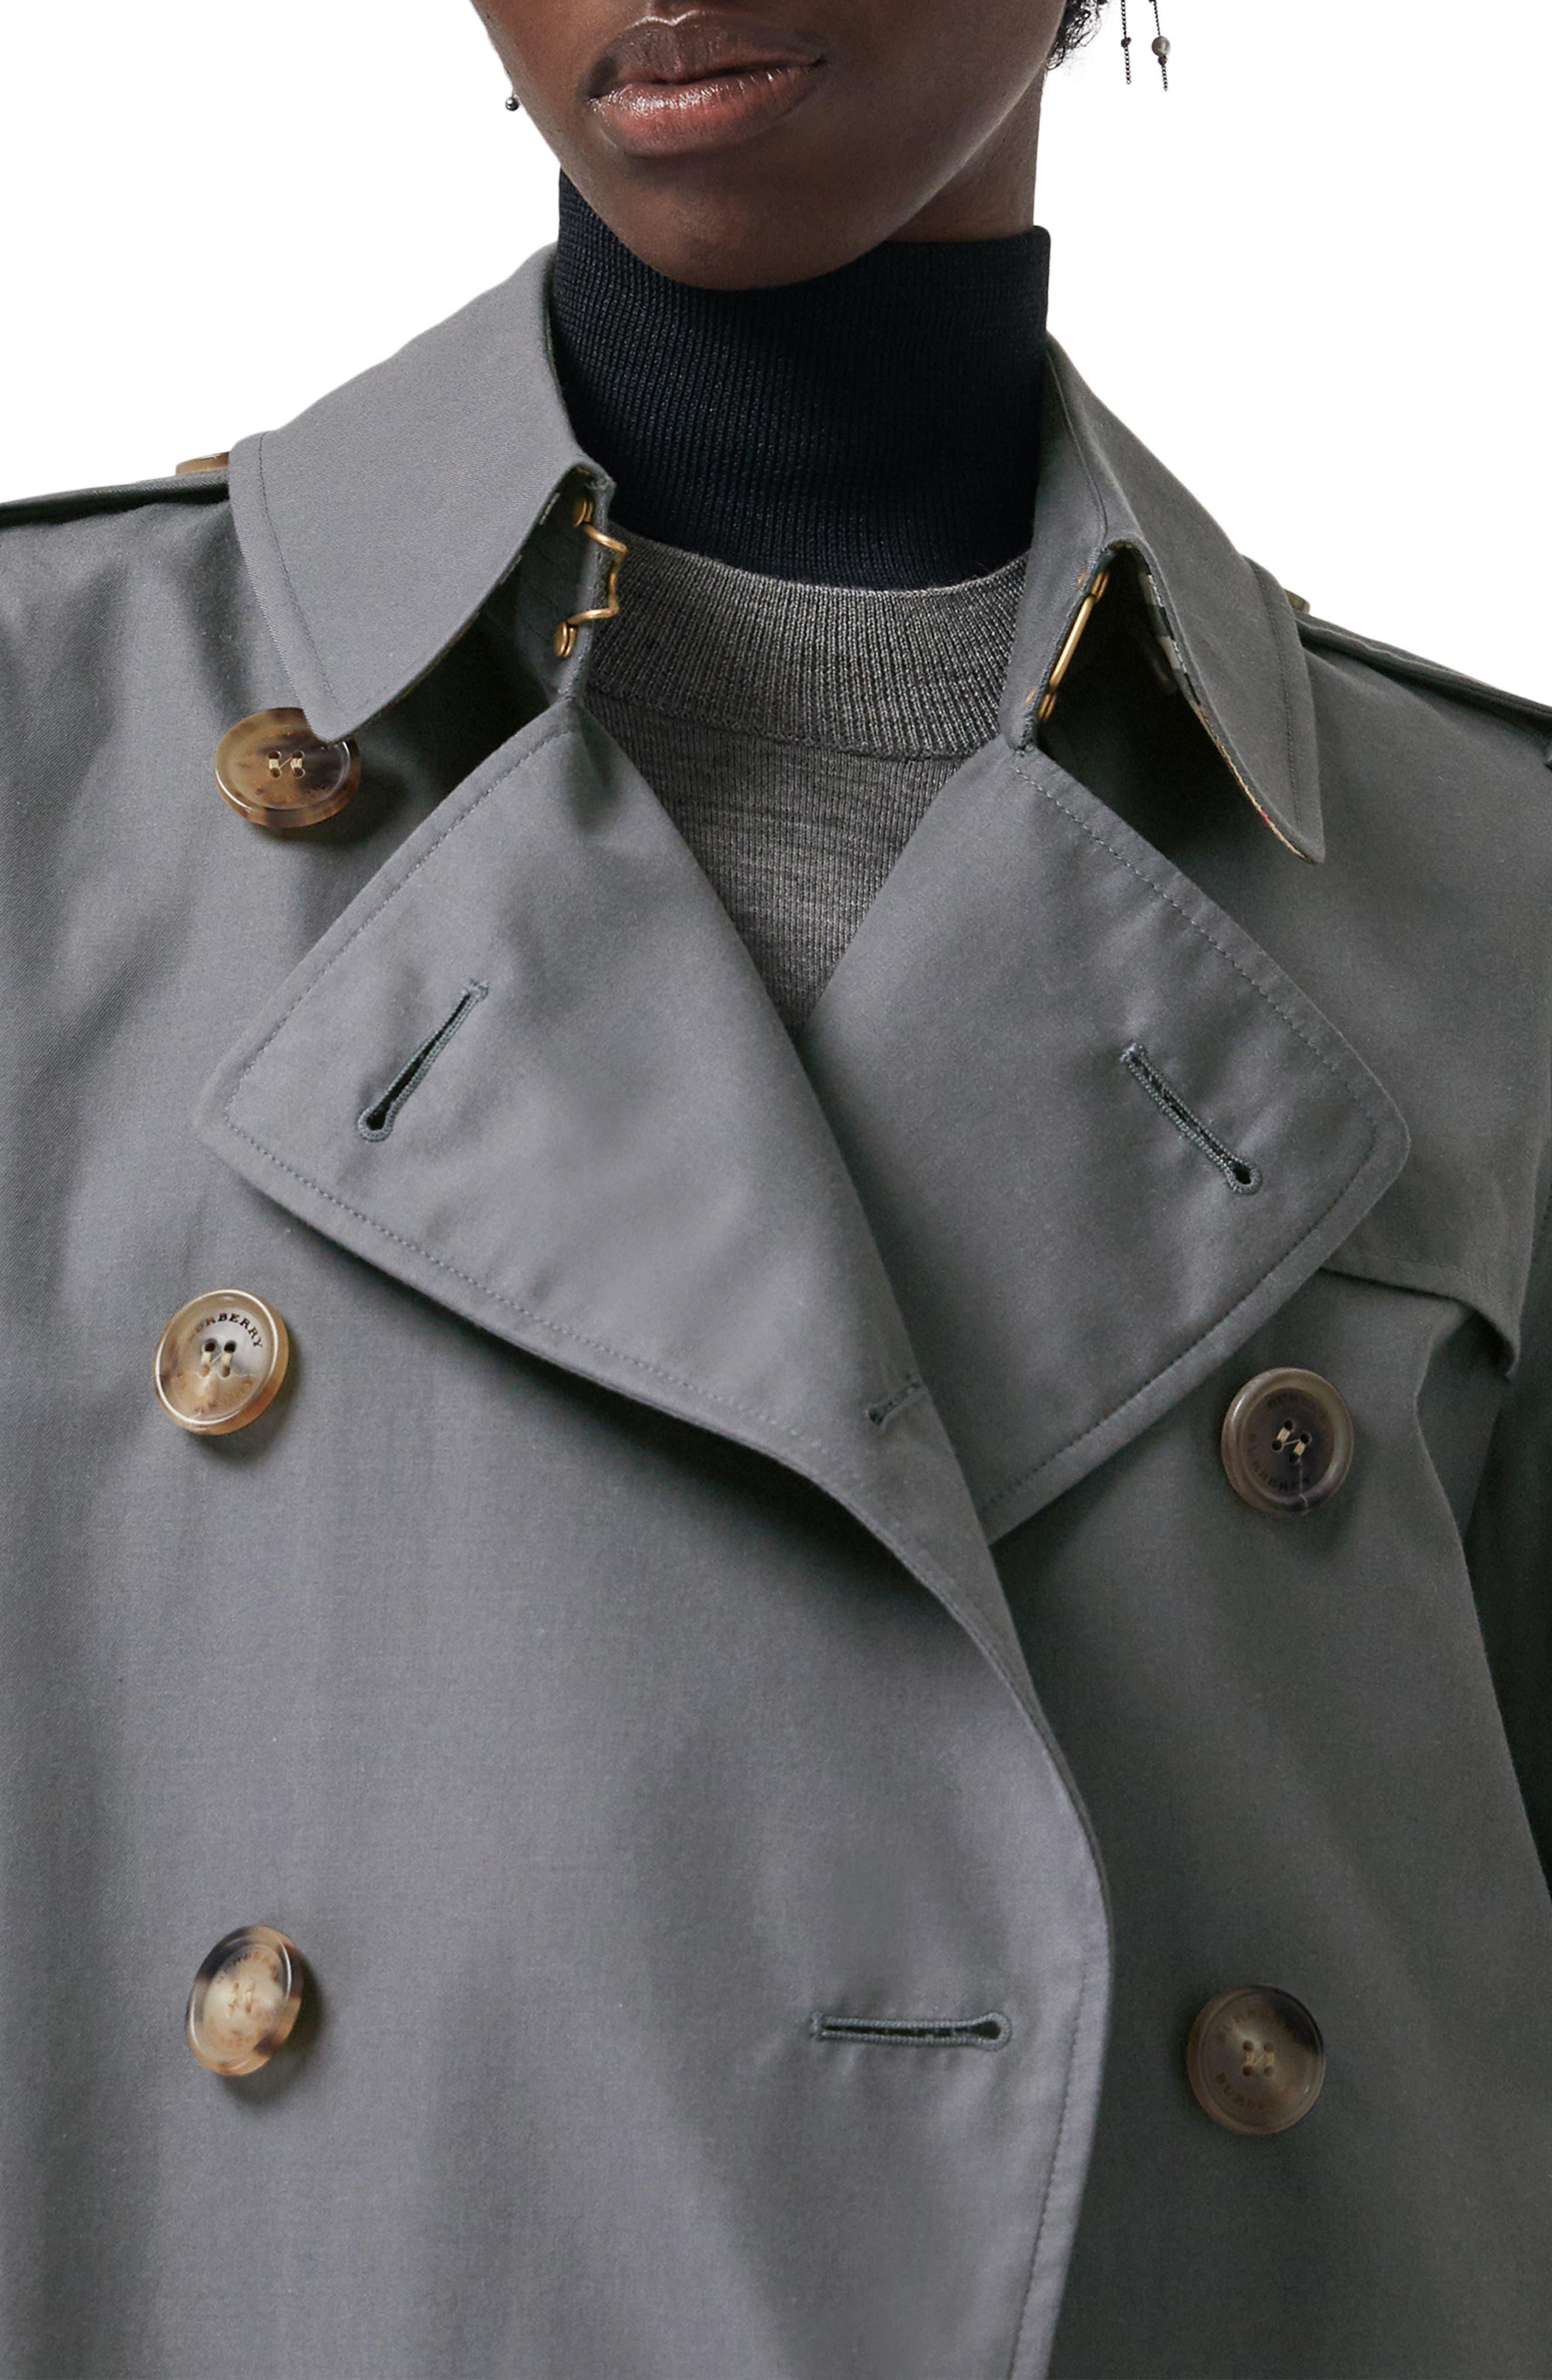 BURBERRY, Kensington Long Heritage Trench Coat, Alternate thumbnail 3, color, MID GREY